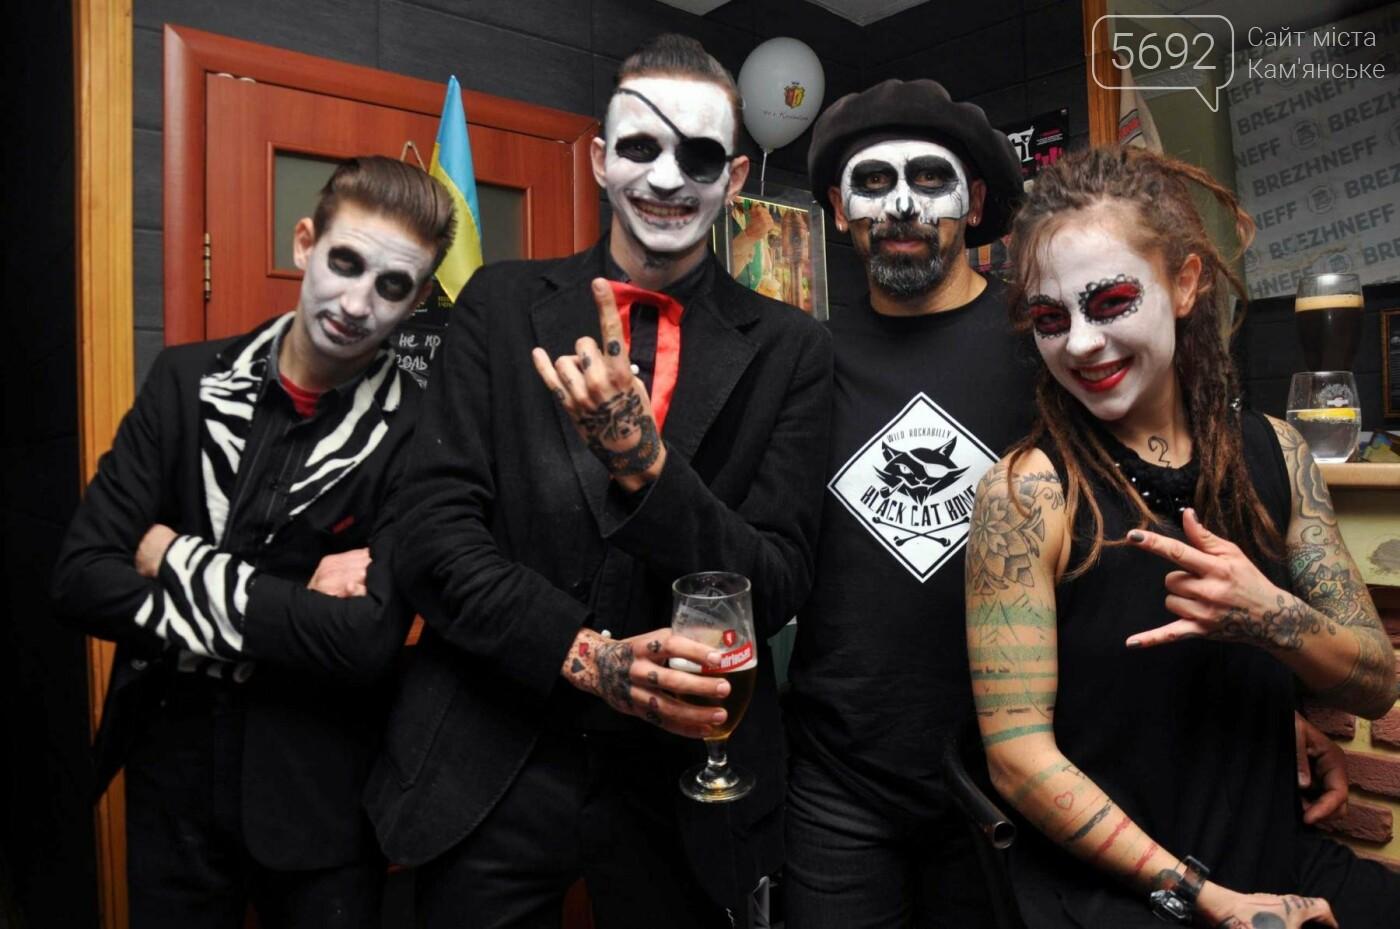 Жителей Каменского приглашают на празднование Хэллоуина, фото-2